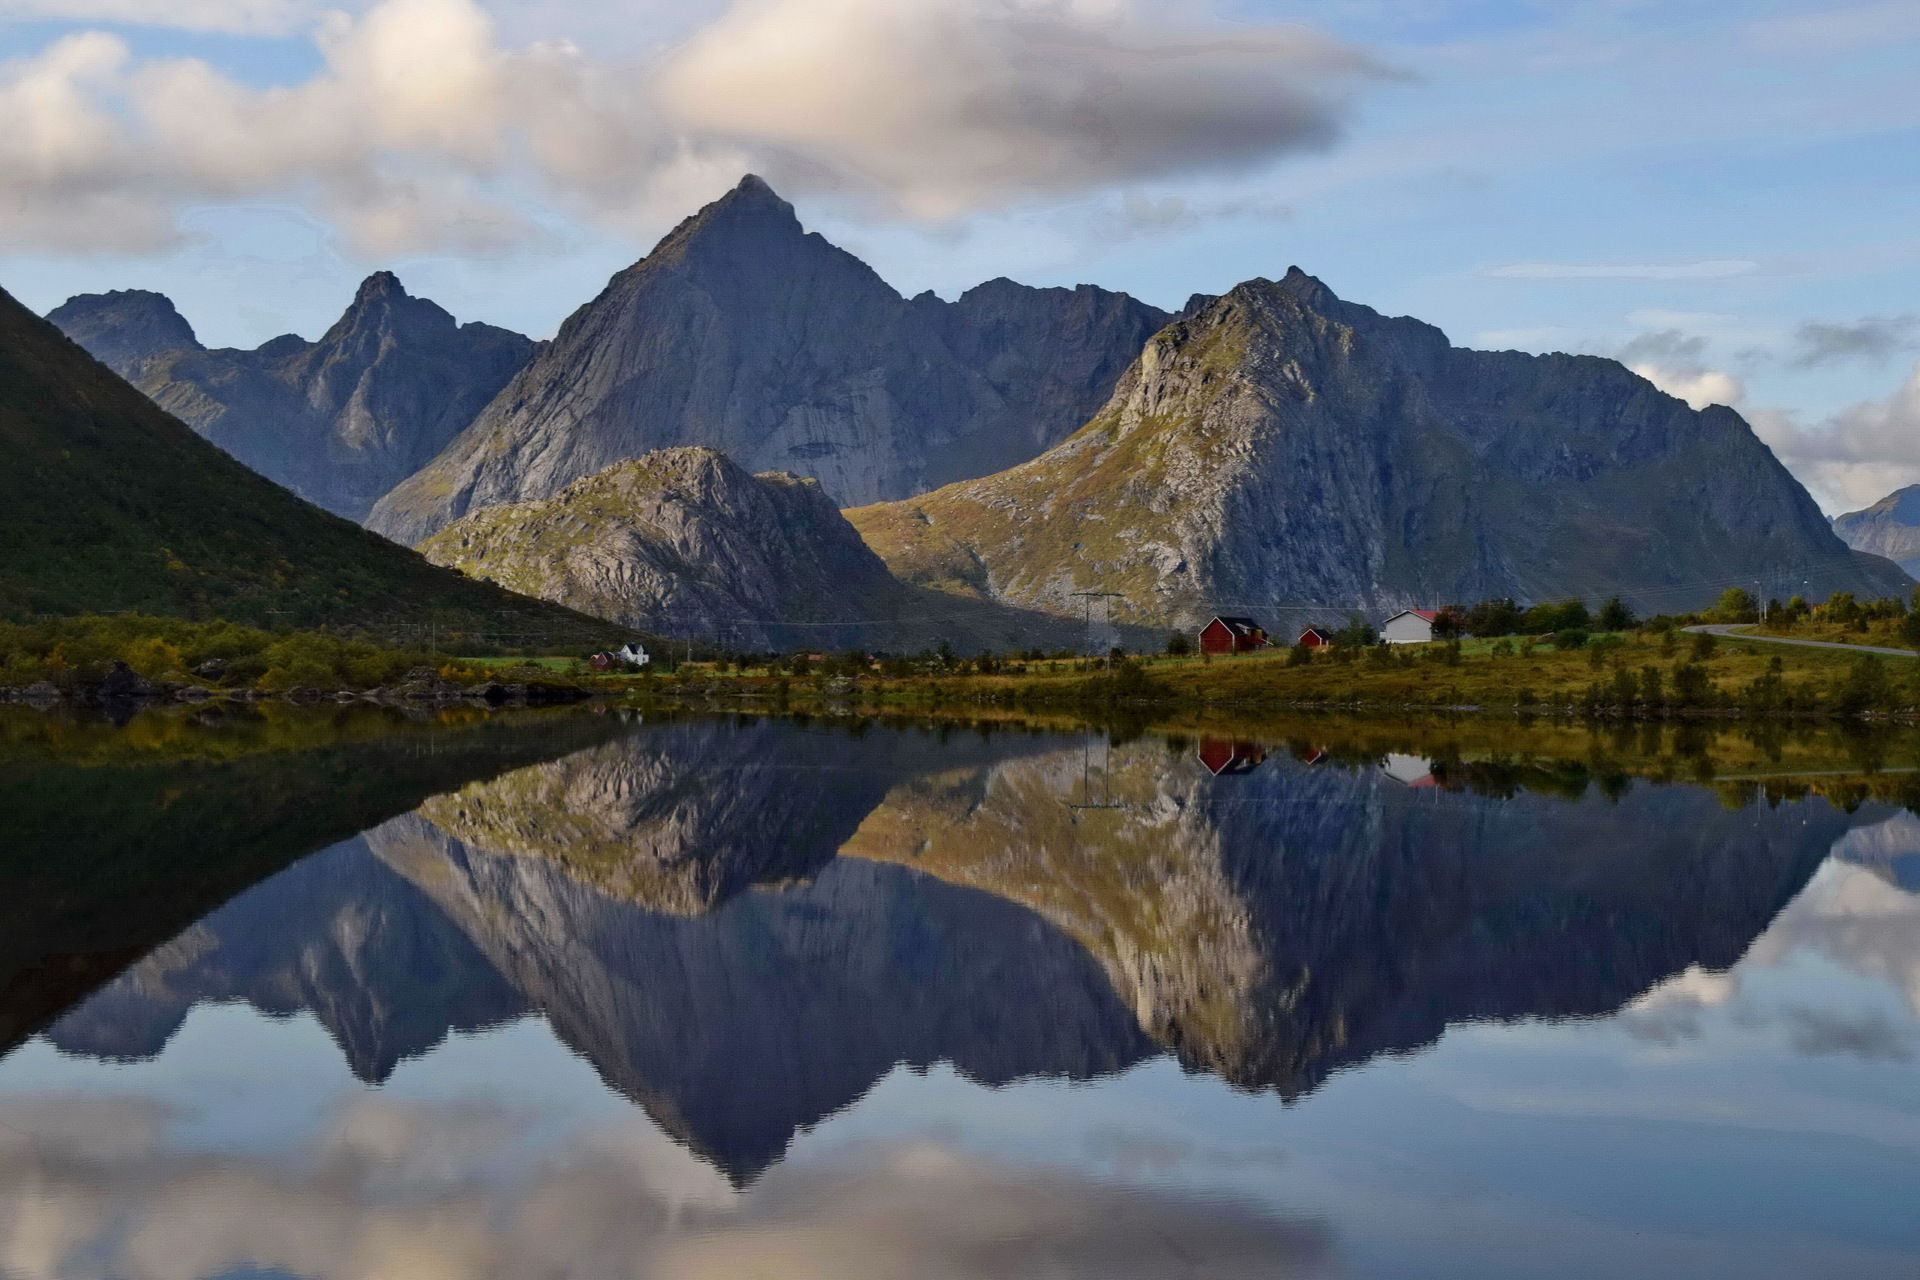 Second_290_Lofoten Landscape.jpg